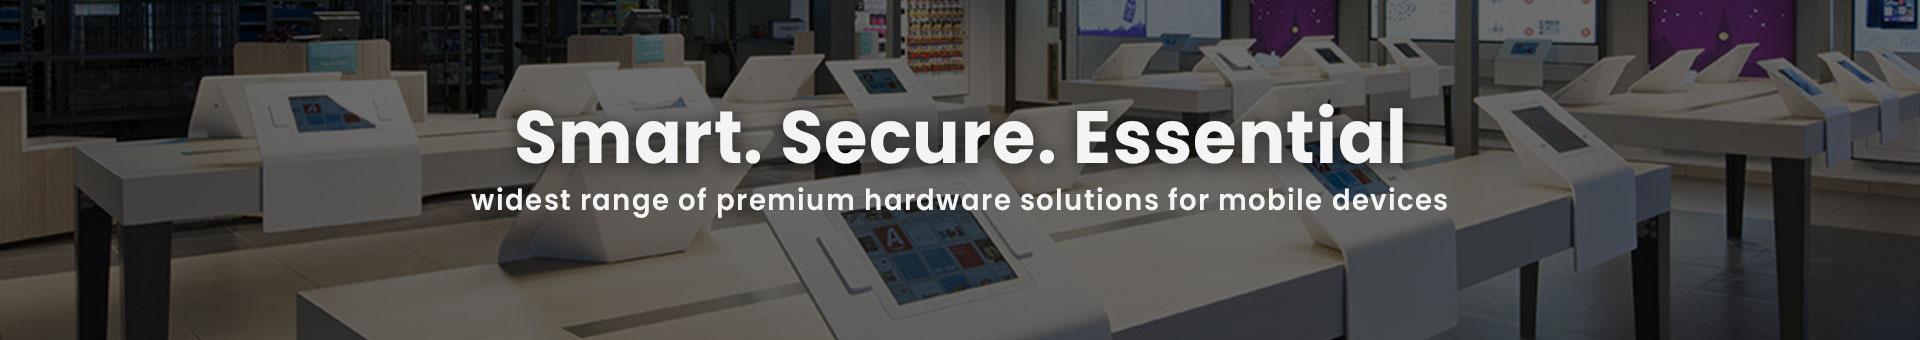 Smart-Secure-Essential